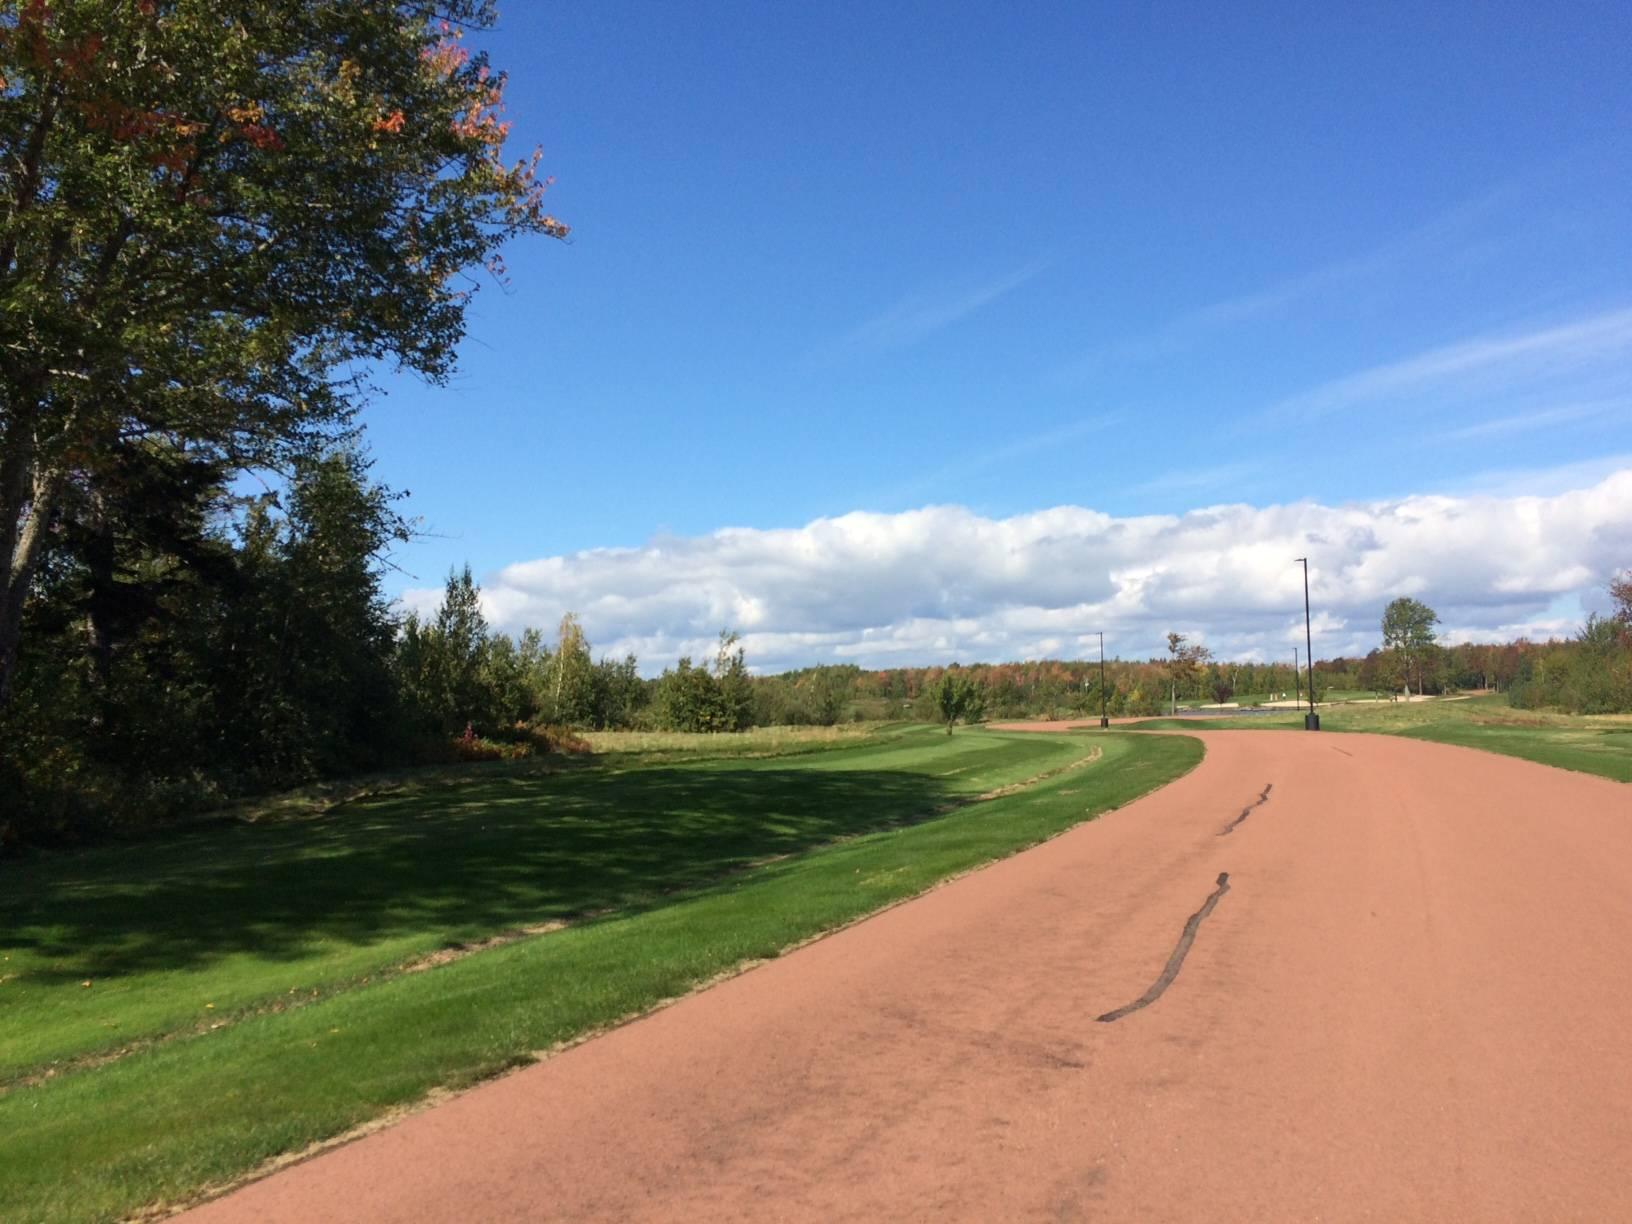 Main road of Fox Harb'r